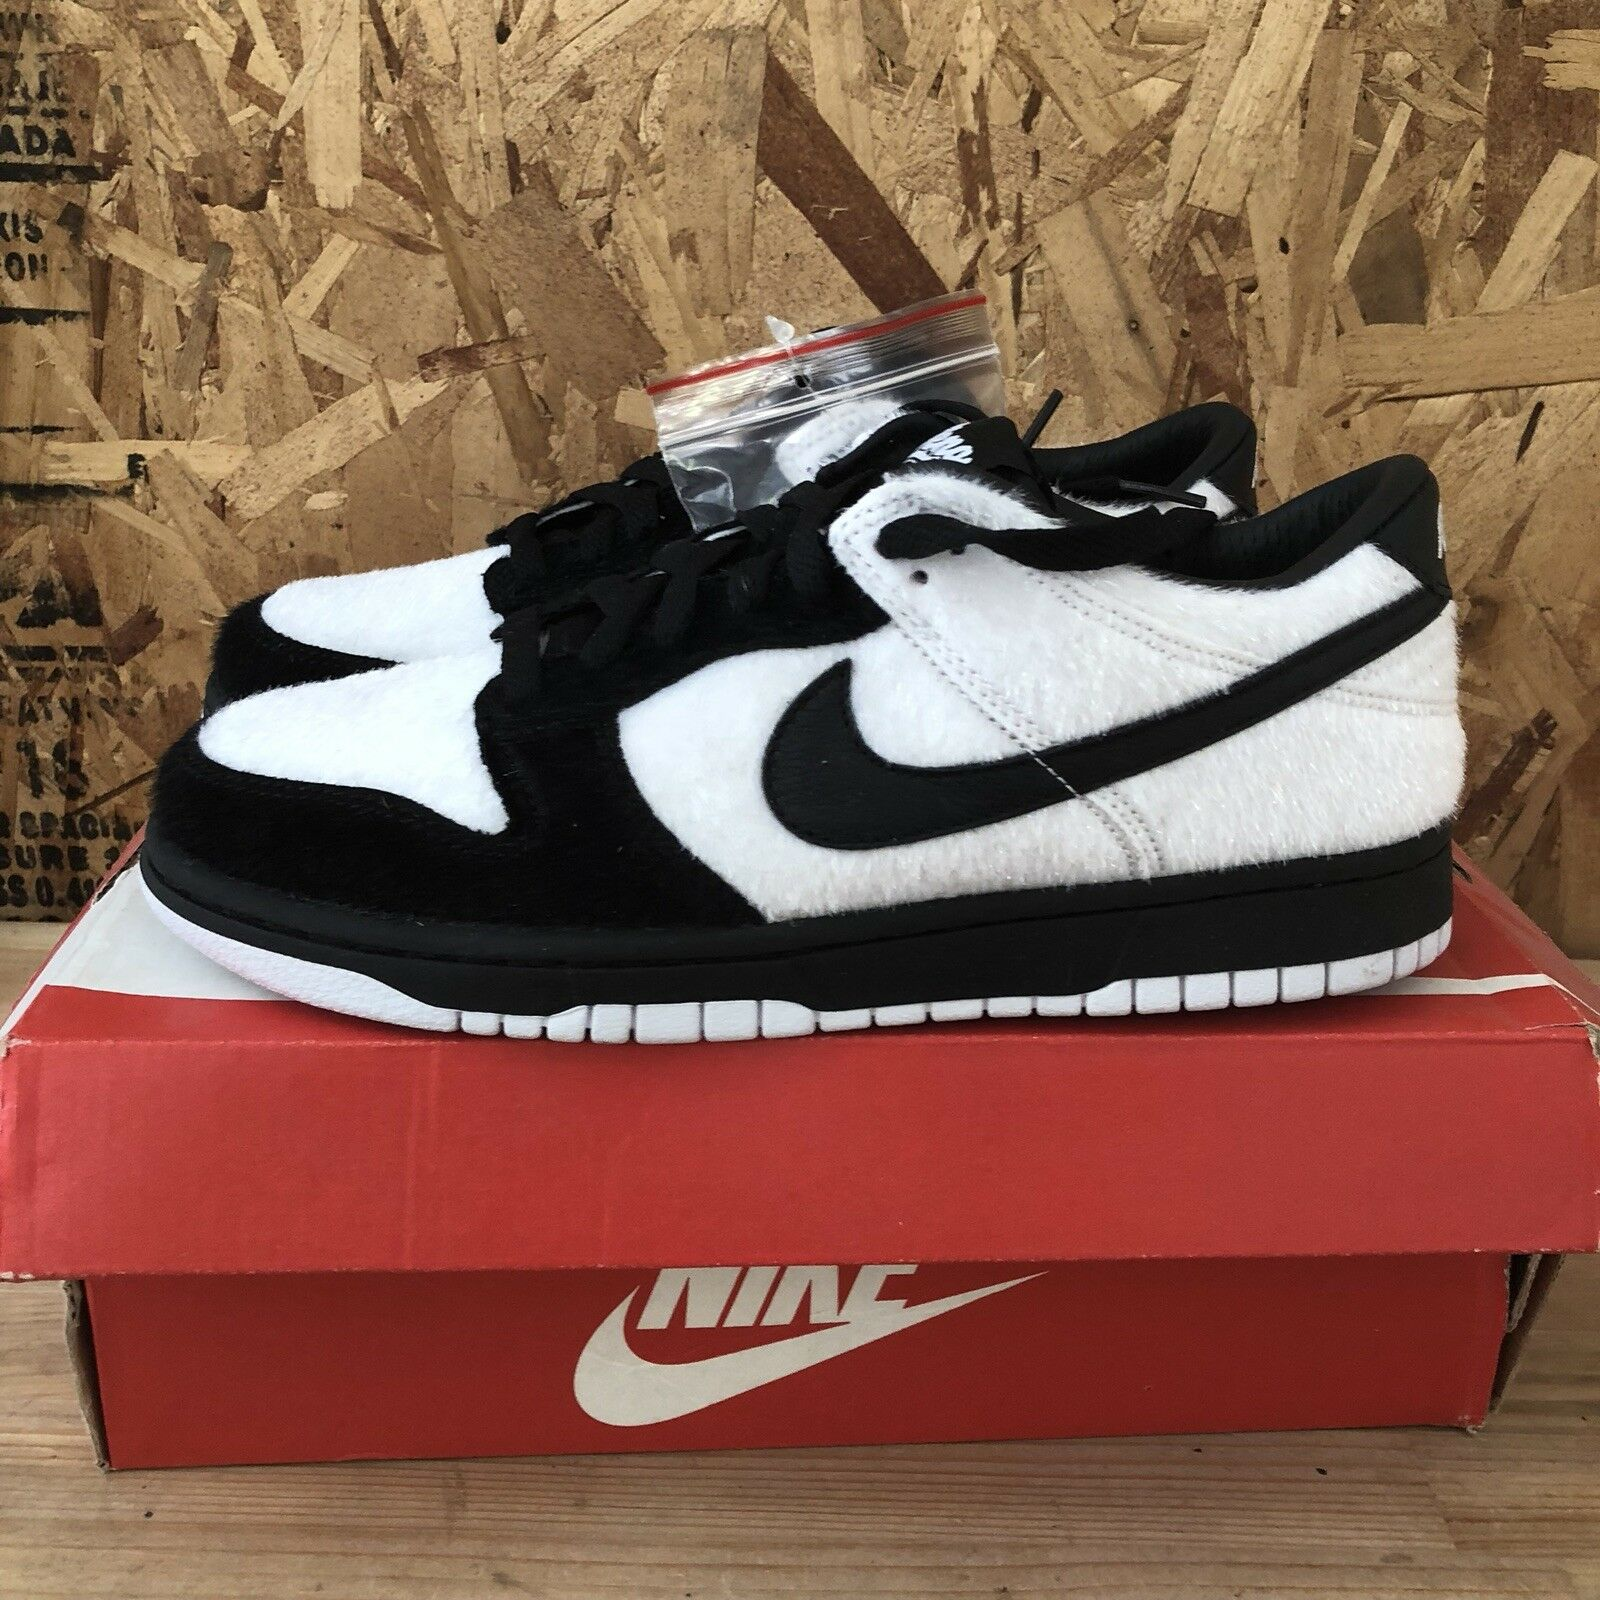 sports shoes 8cde7 33e9f Nike Dunk Low Premium QS BG - - - White   Black Size 6.5Y New